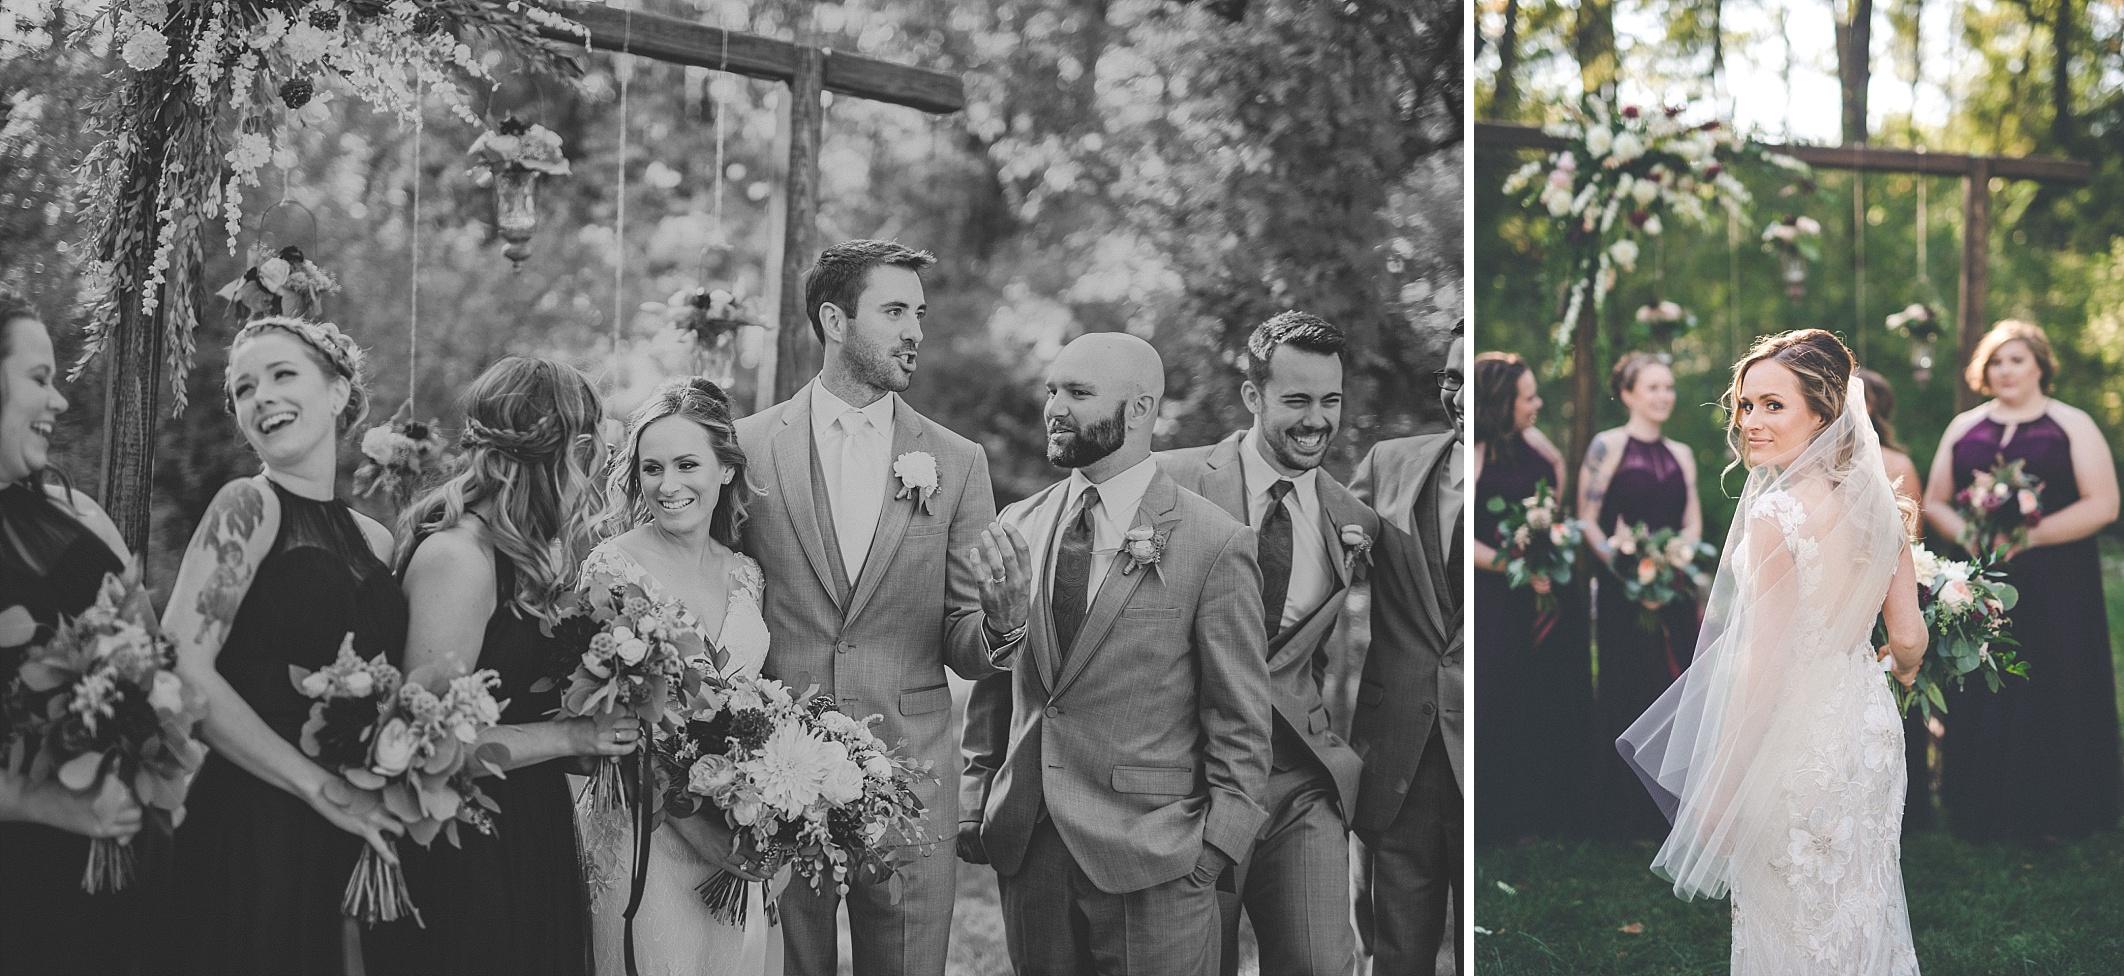 wedding-photographer-dayton-ohio_0198.jpg